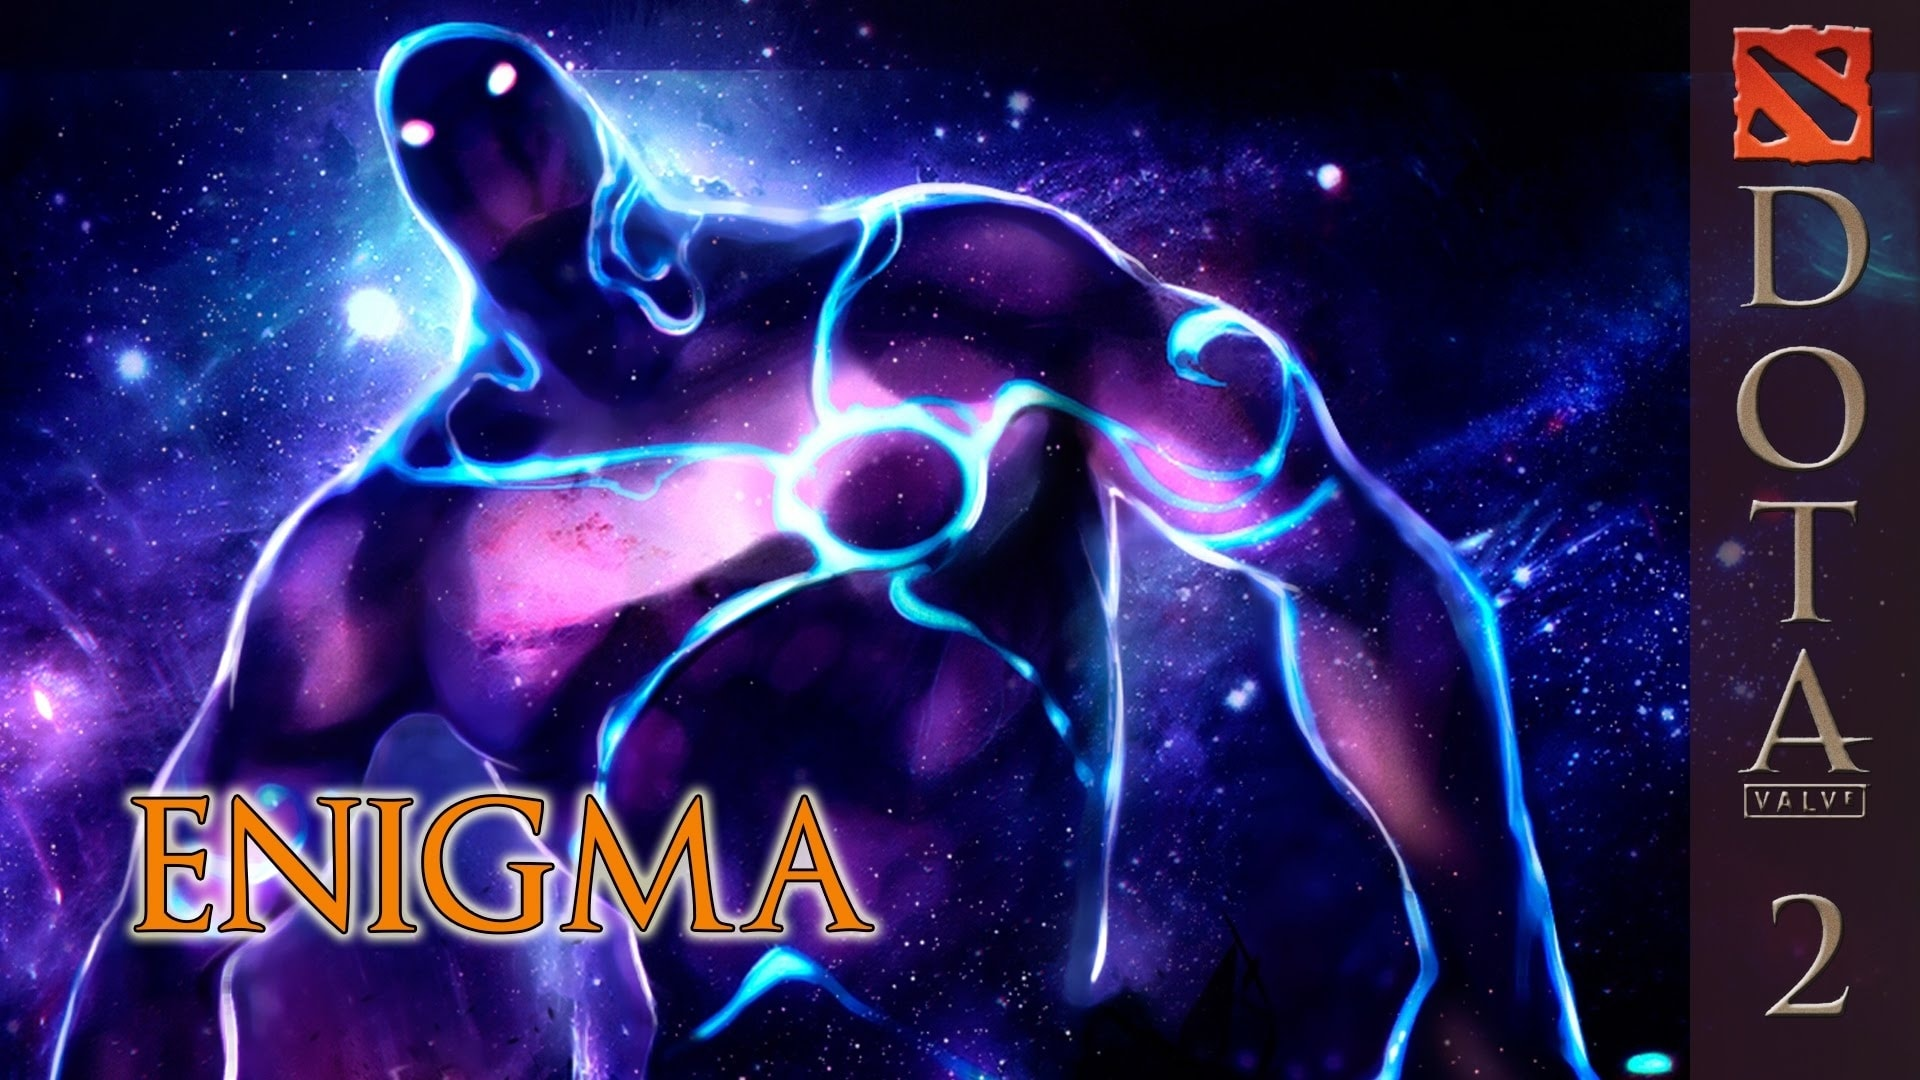 Dota2 : Enigma Pictures